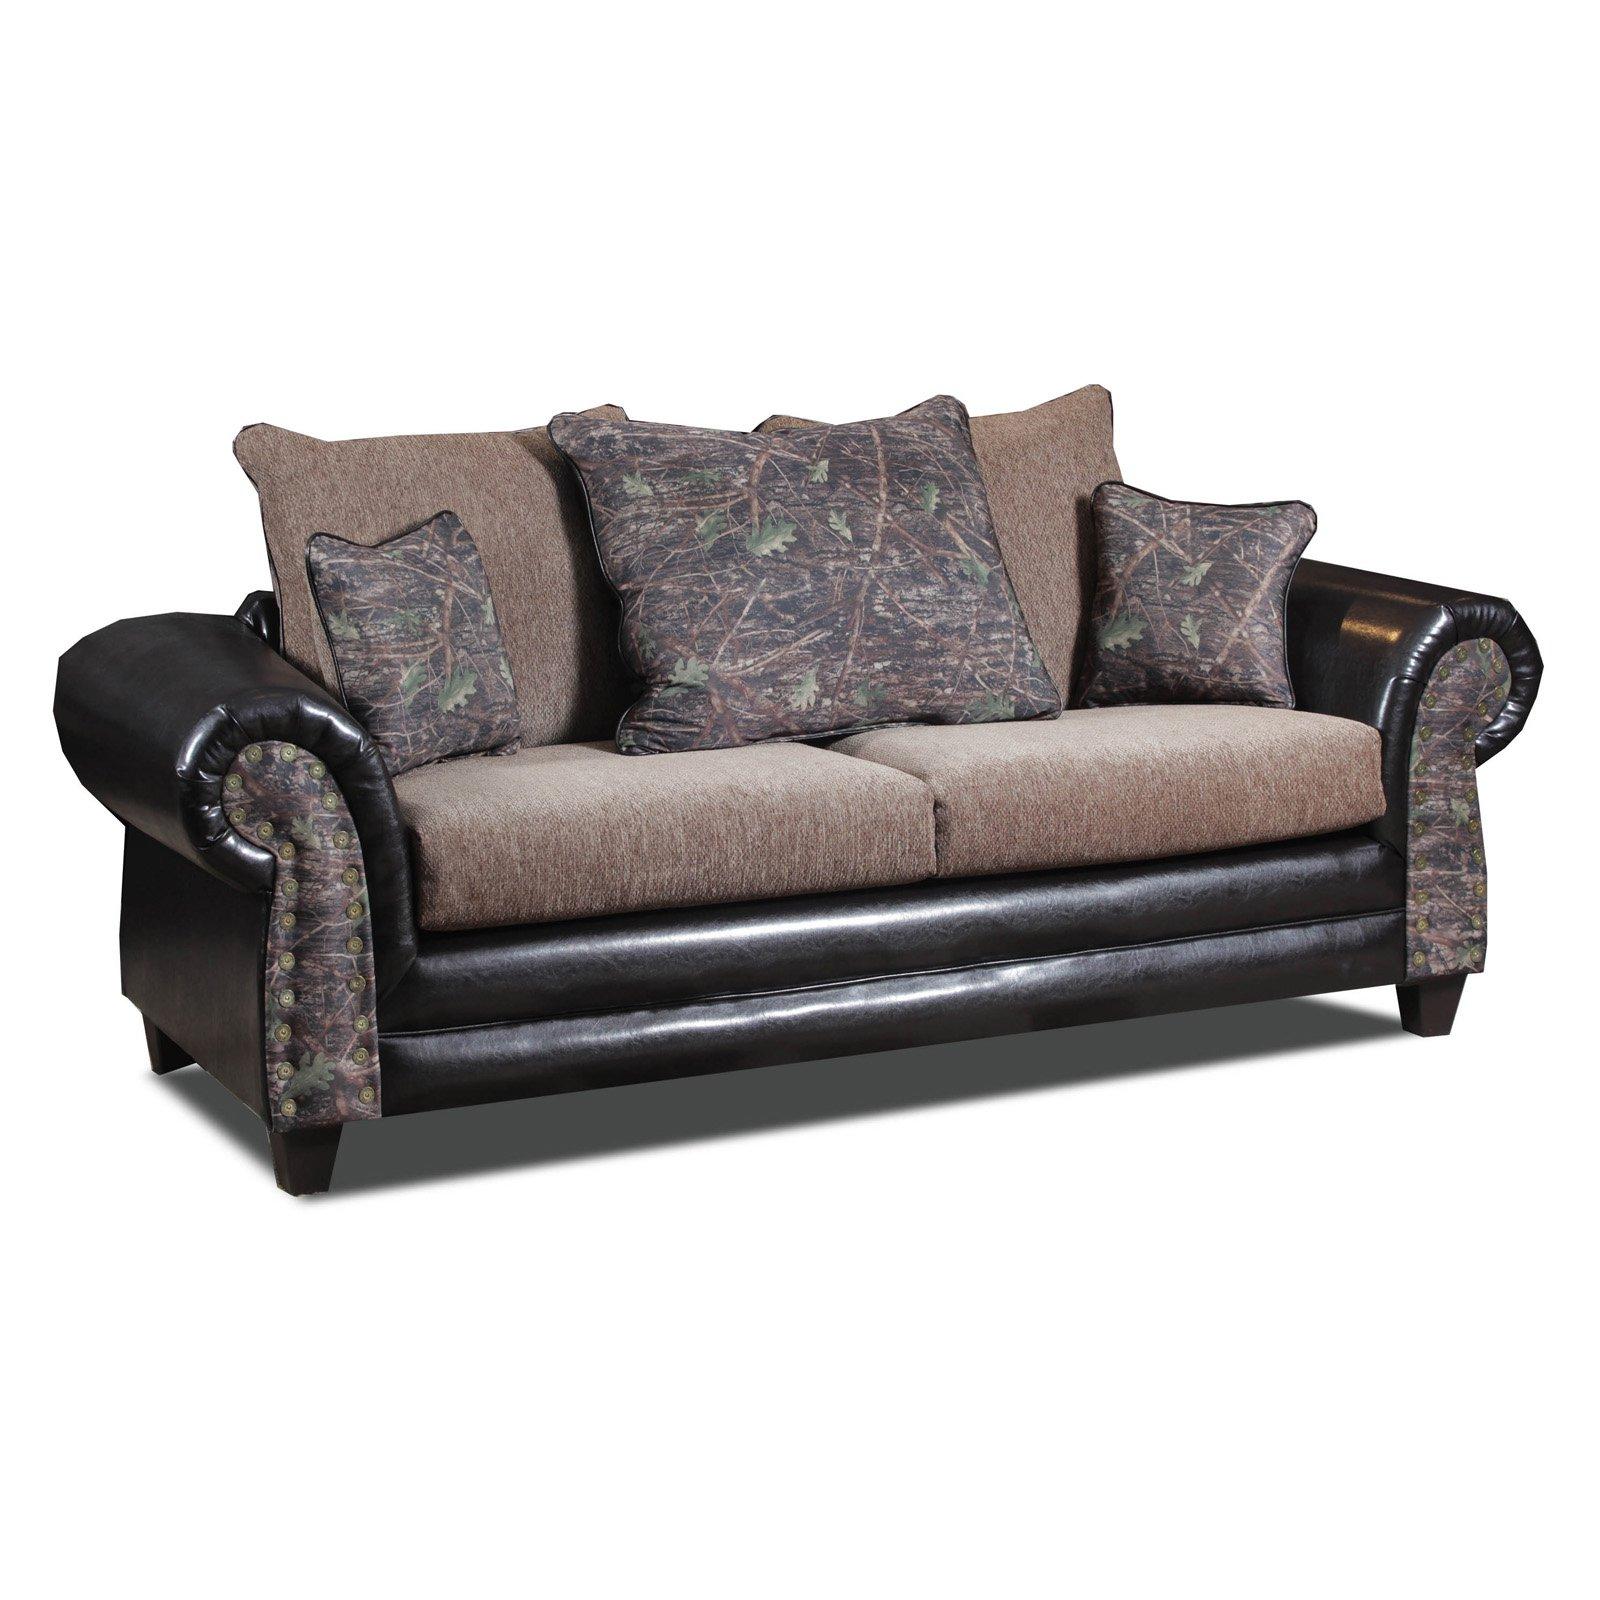 Chelsea Home Caldwell Sofa - Conceal Camo